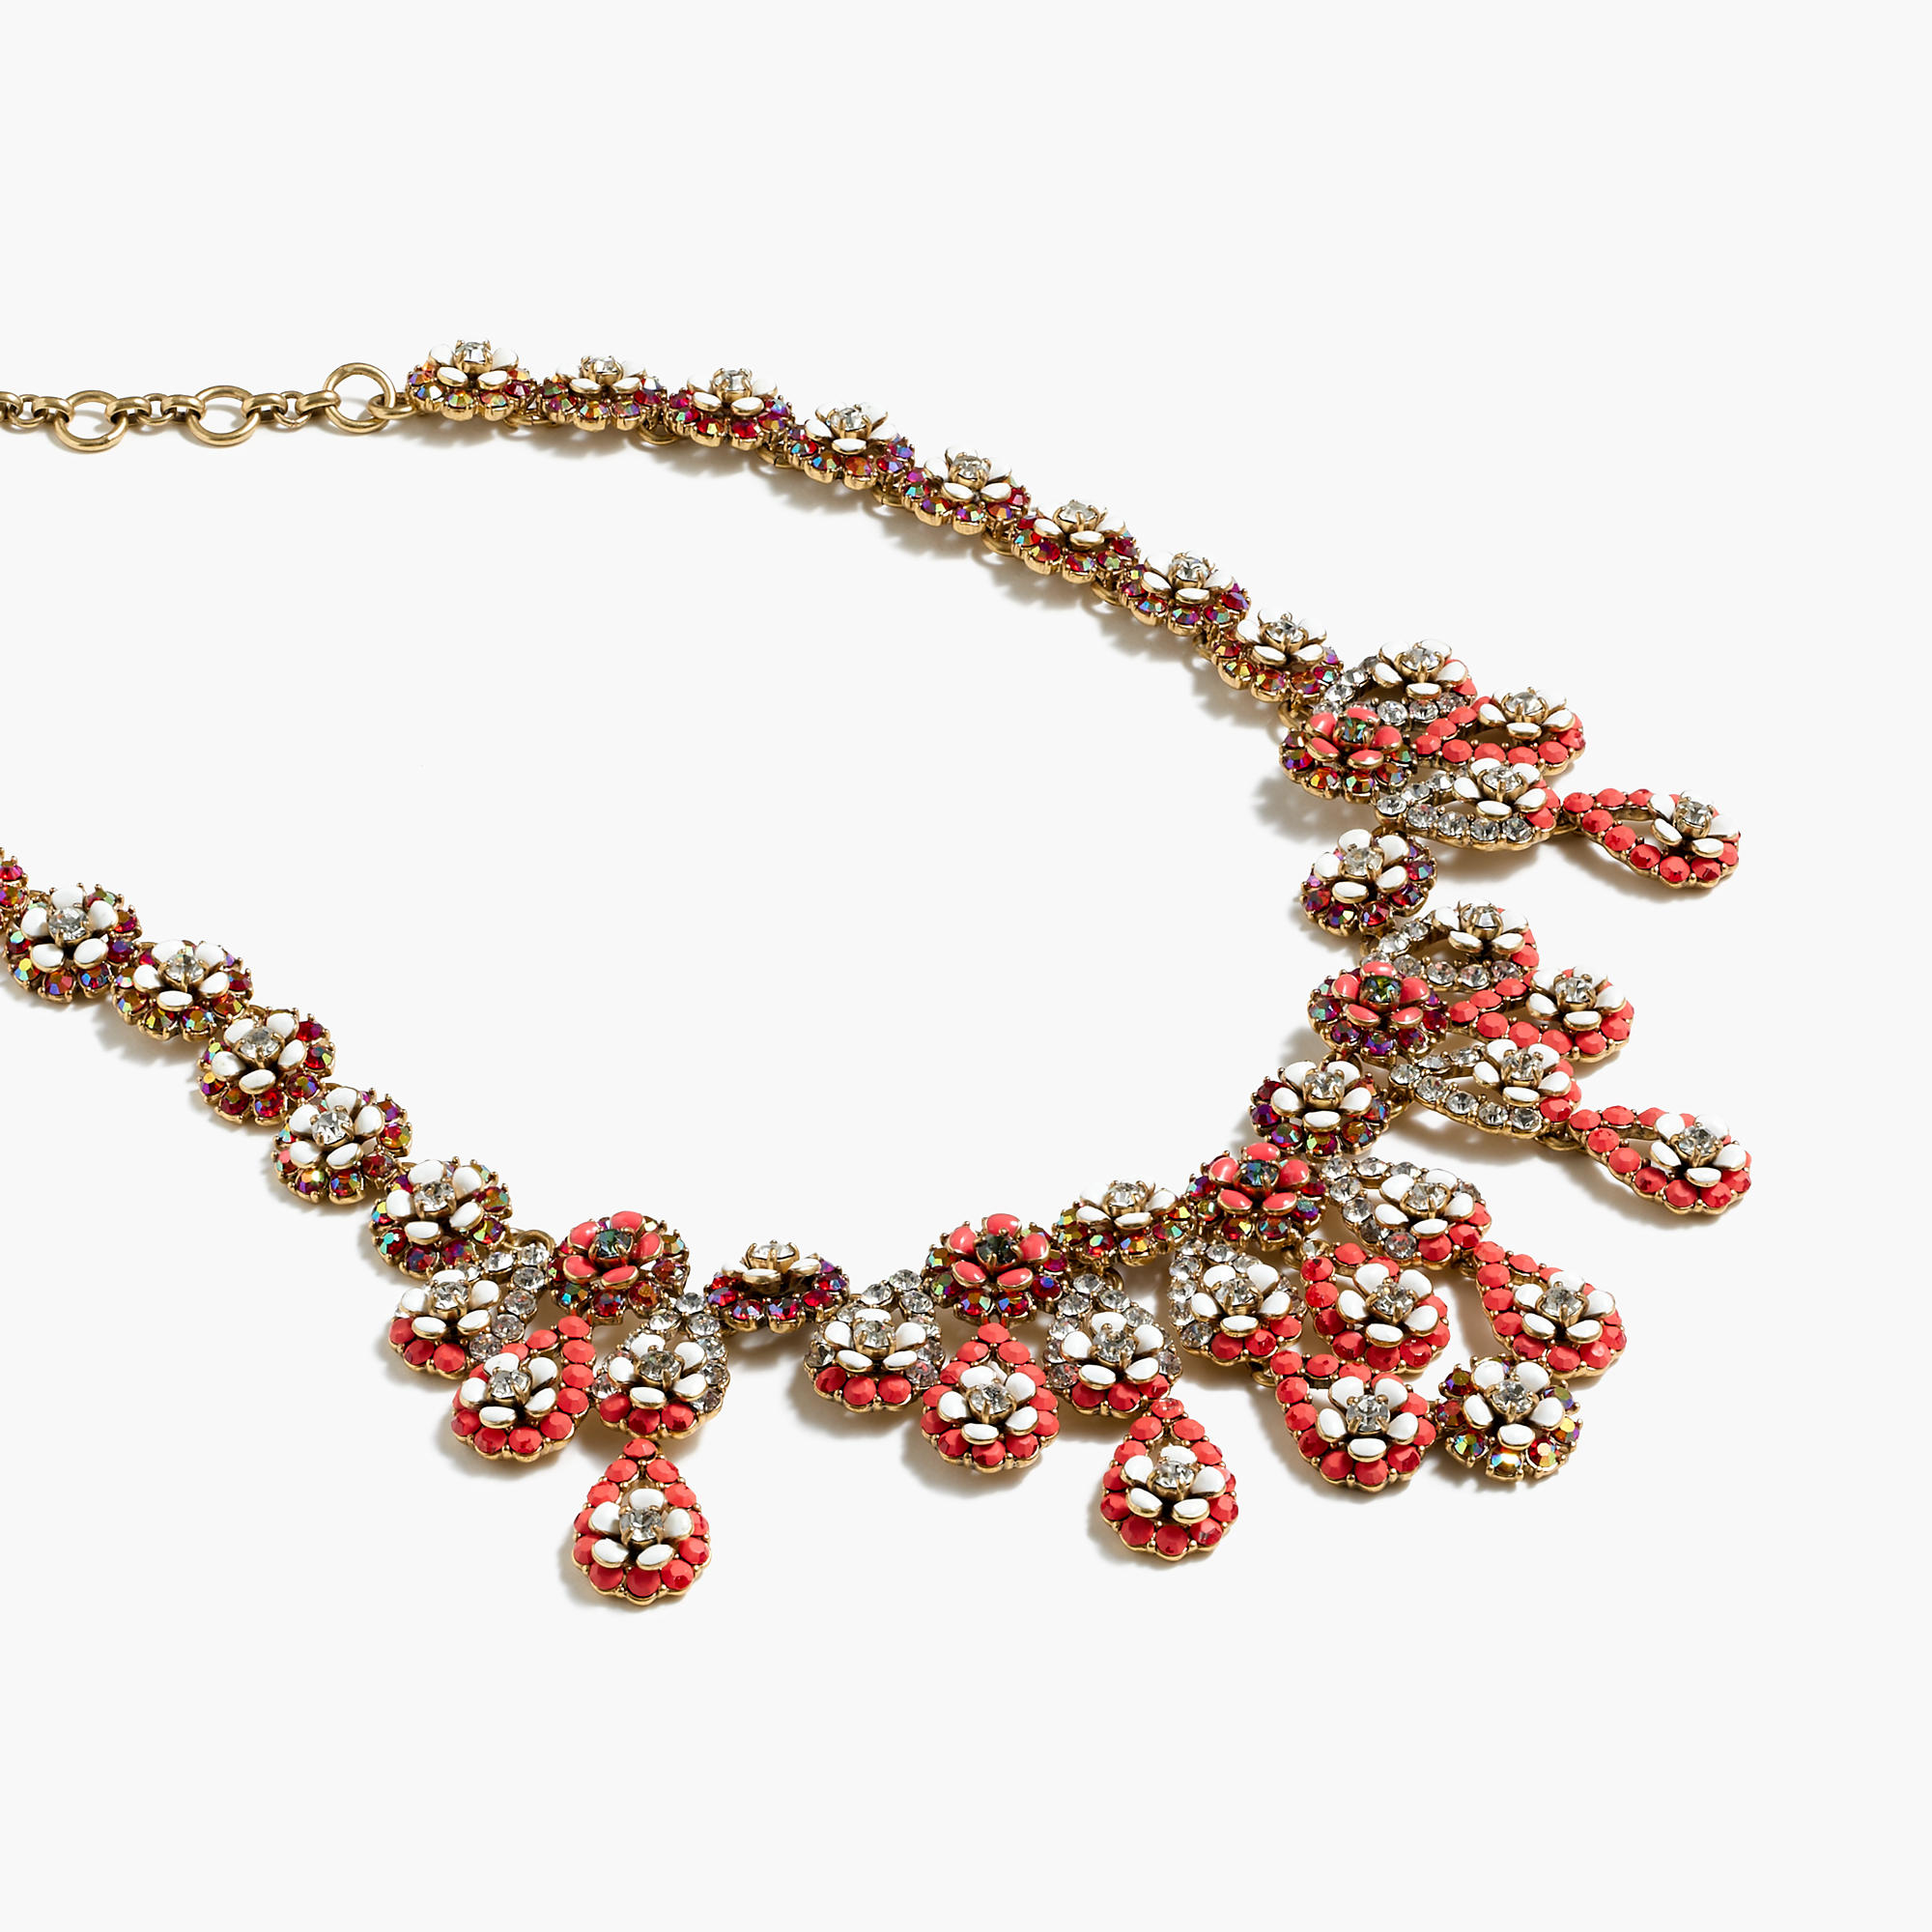 ba04ac35e J.Crew Floral Chandelier Necklace in Orange - Lyst